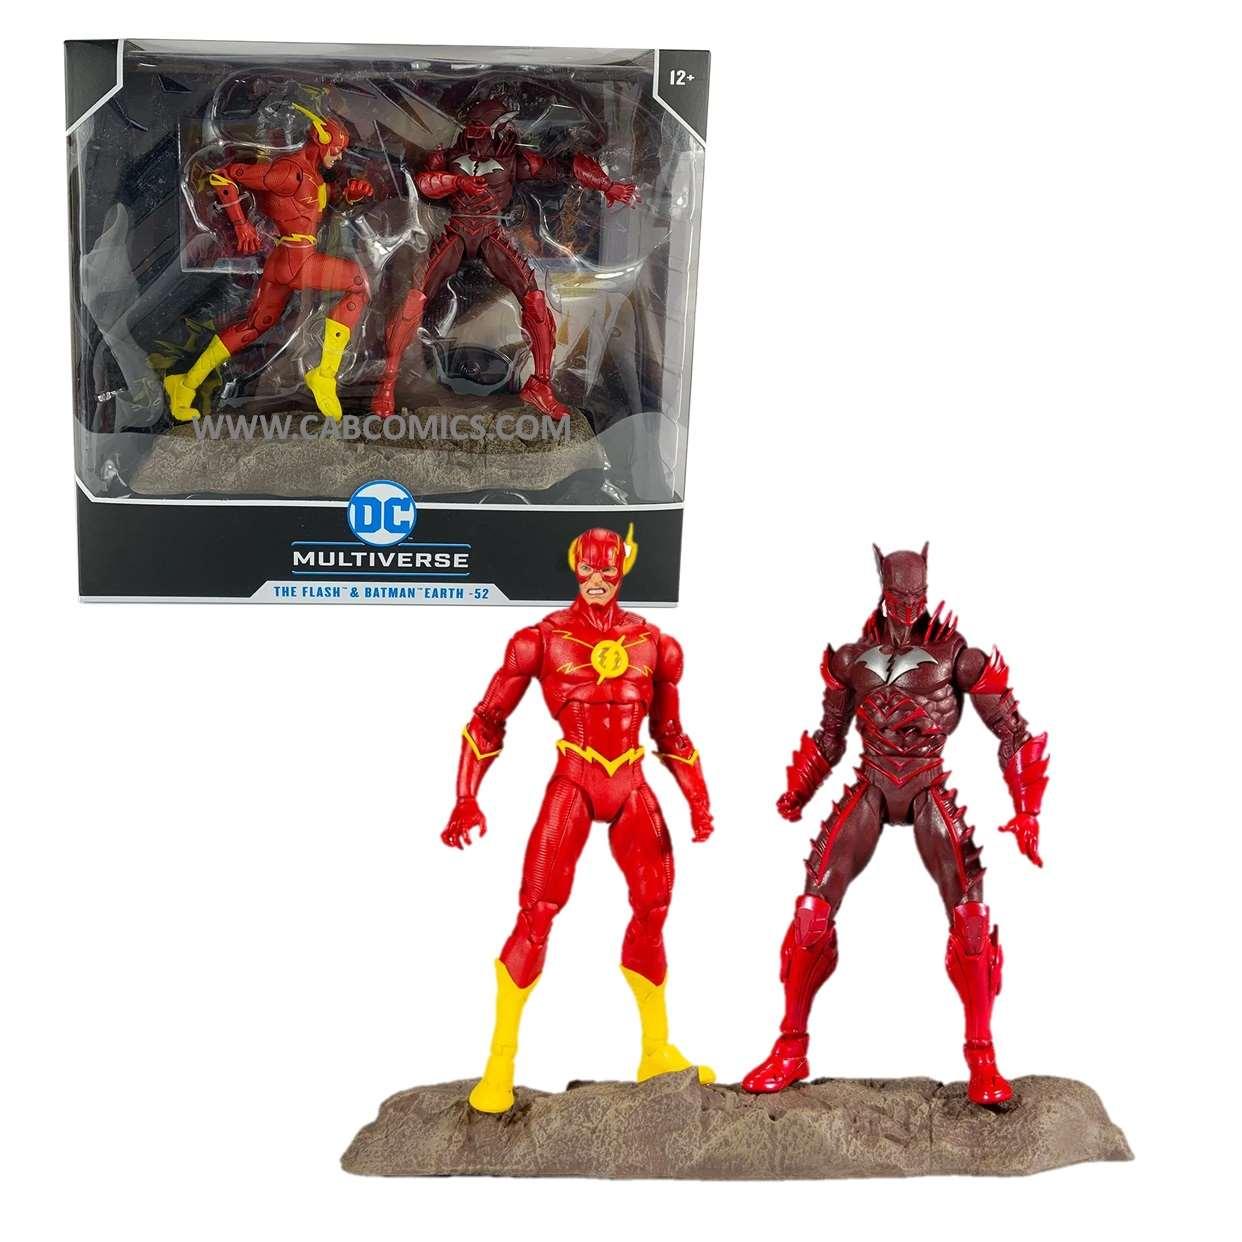 The Flash & Batman Earth #52 Multiverse Mcfarlane Two Pack